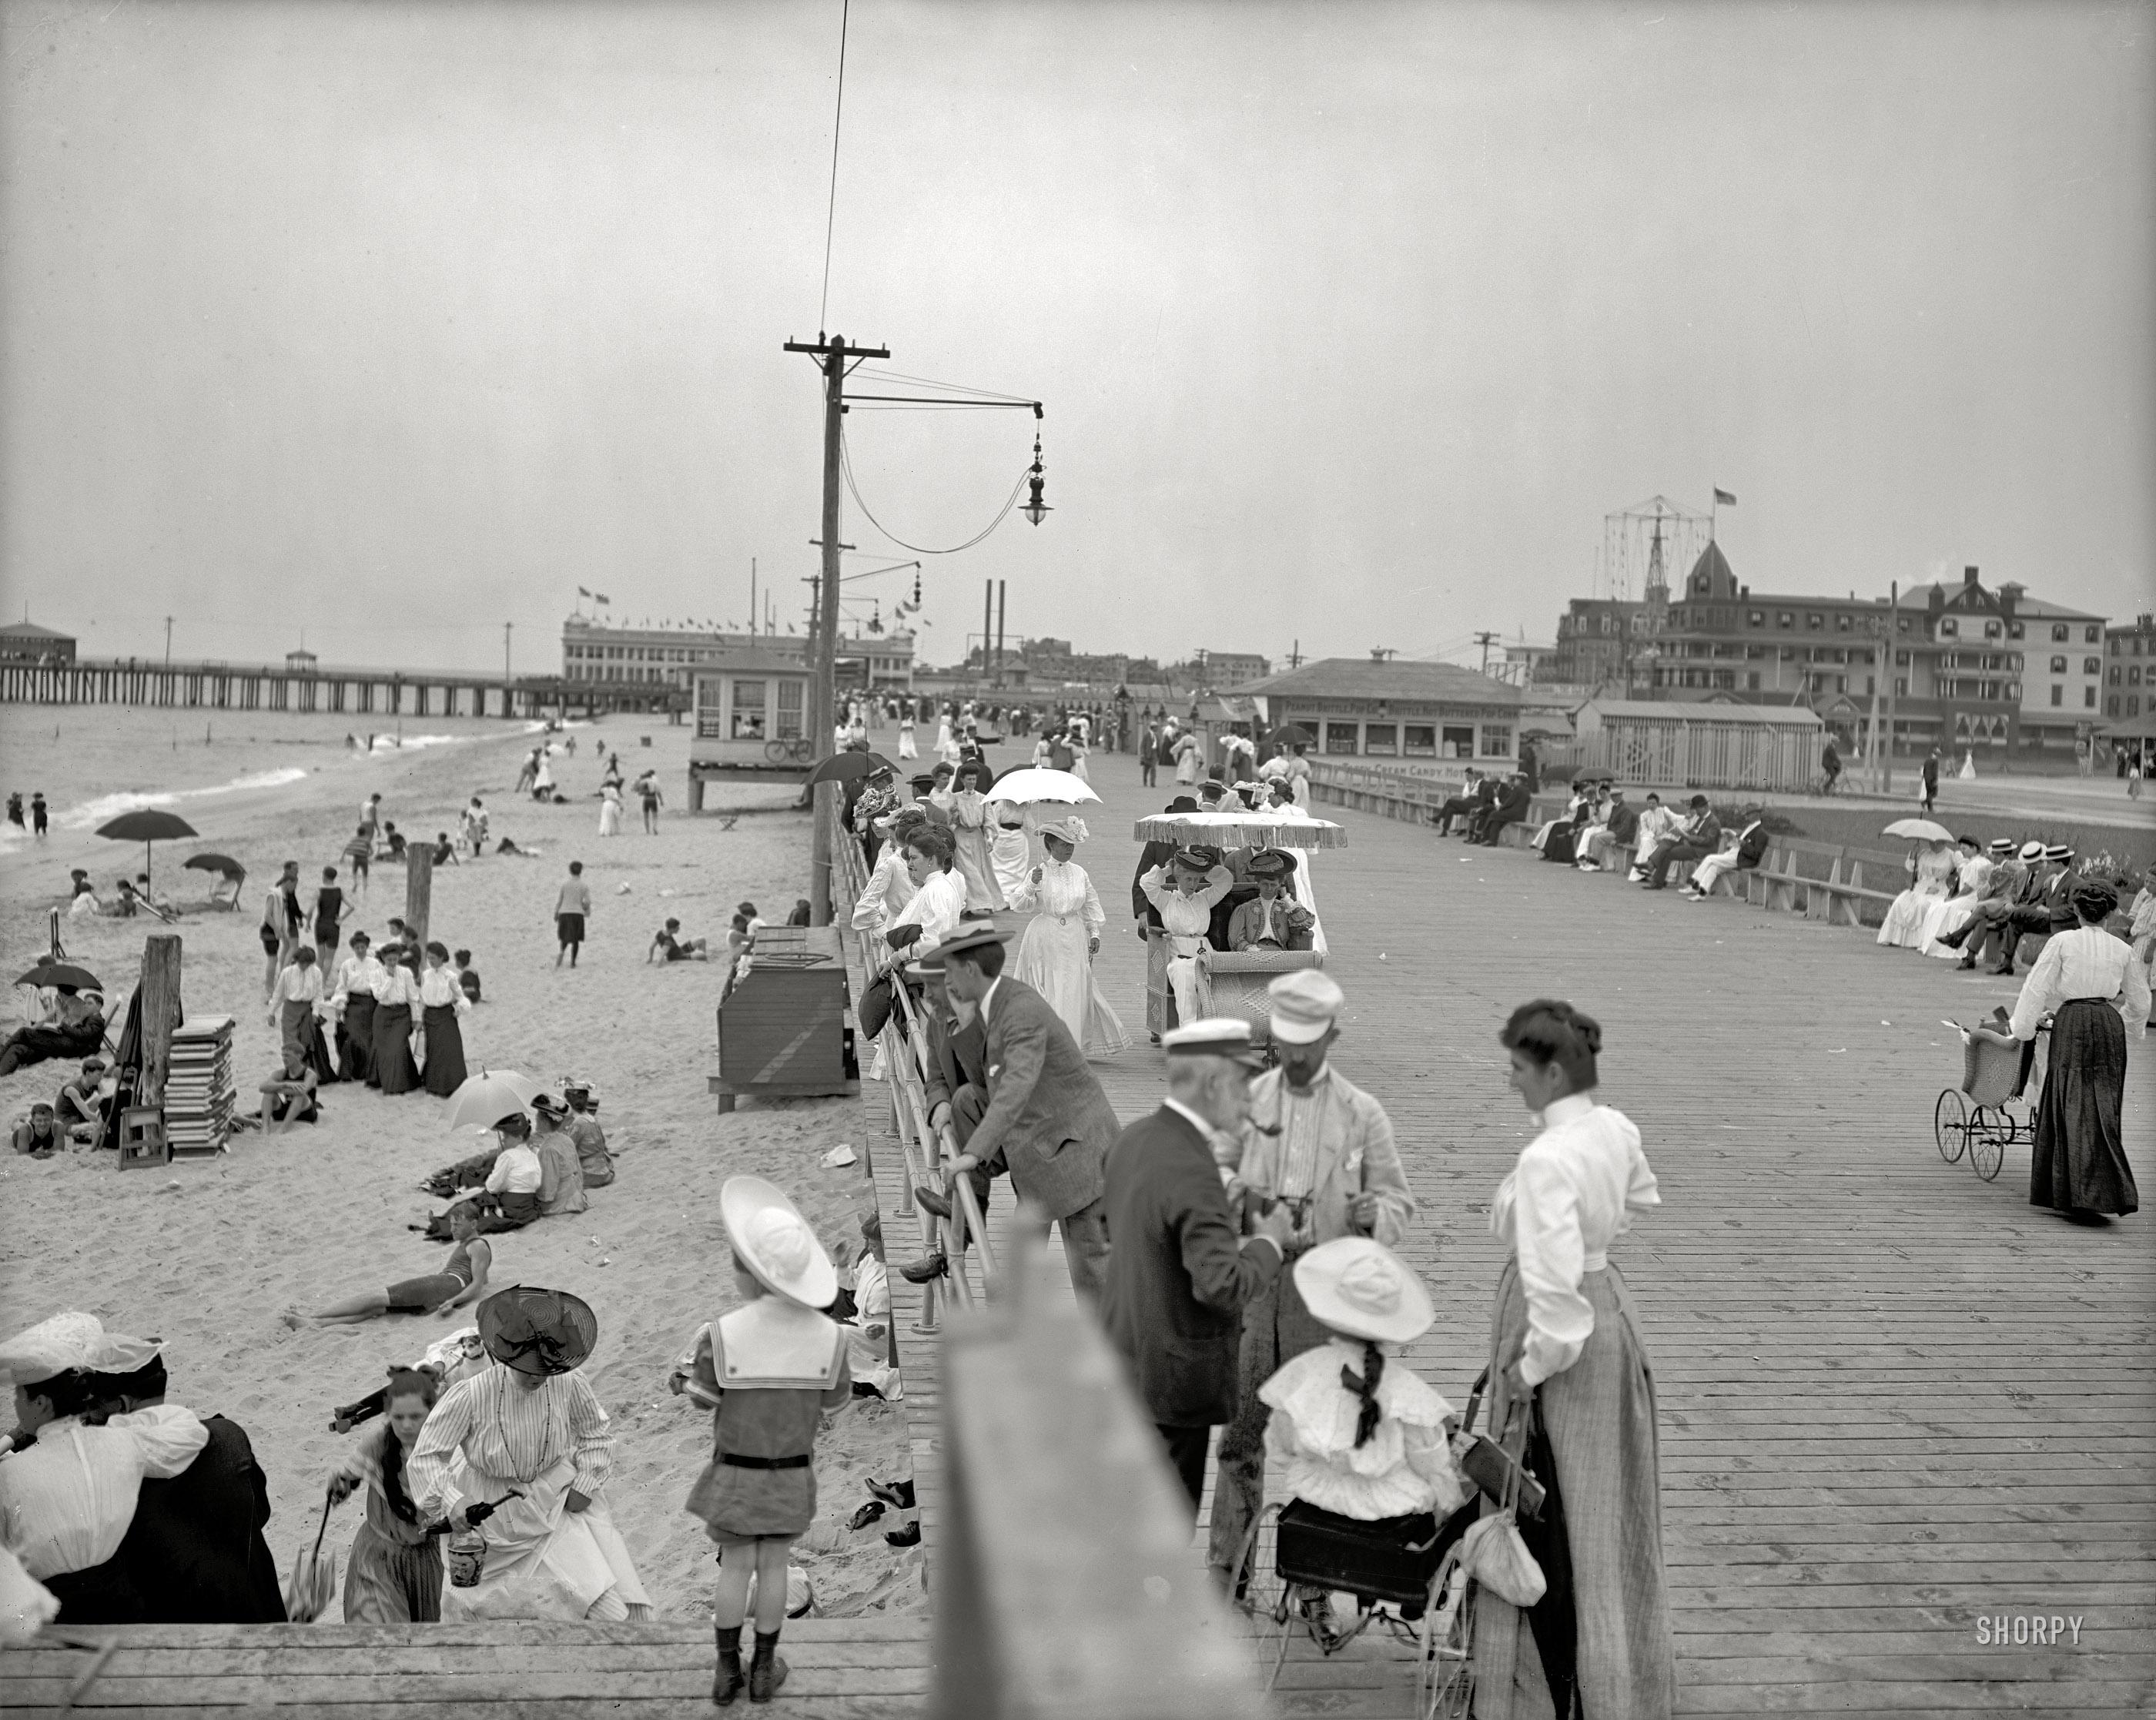 Boardwalk and beach, Asbury Park